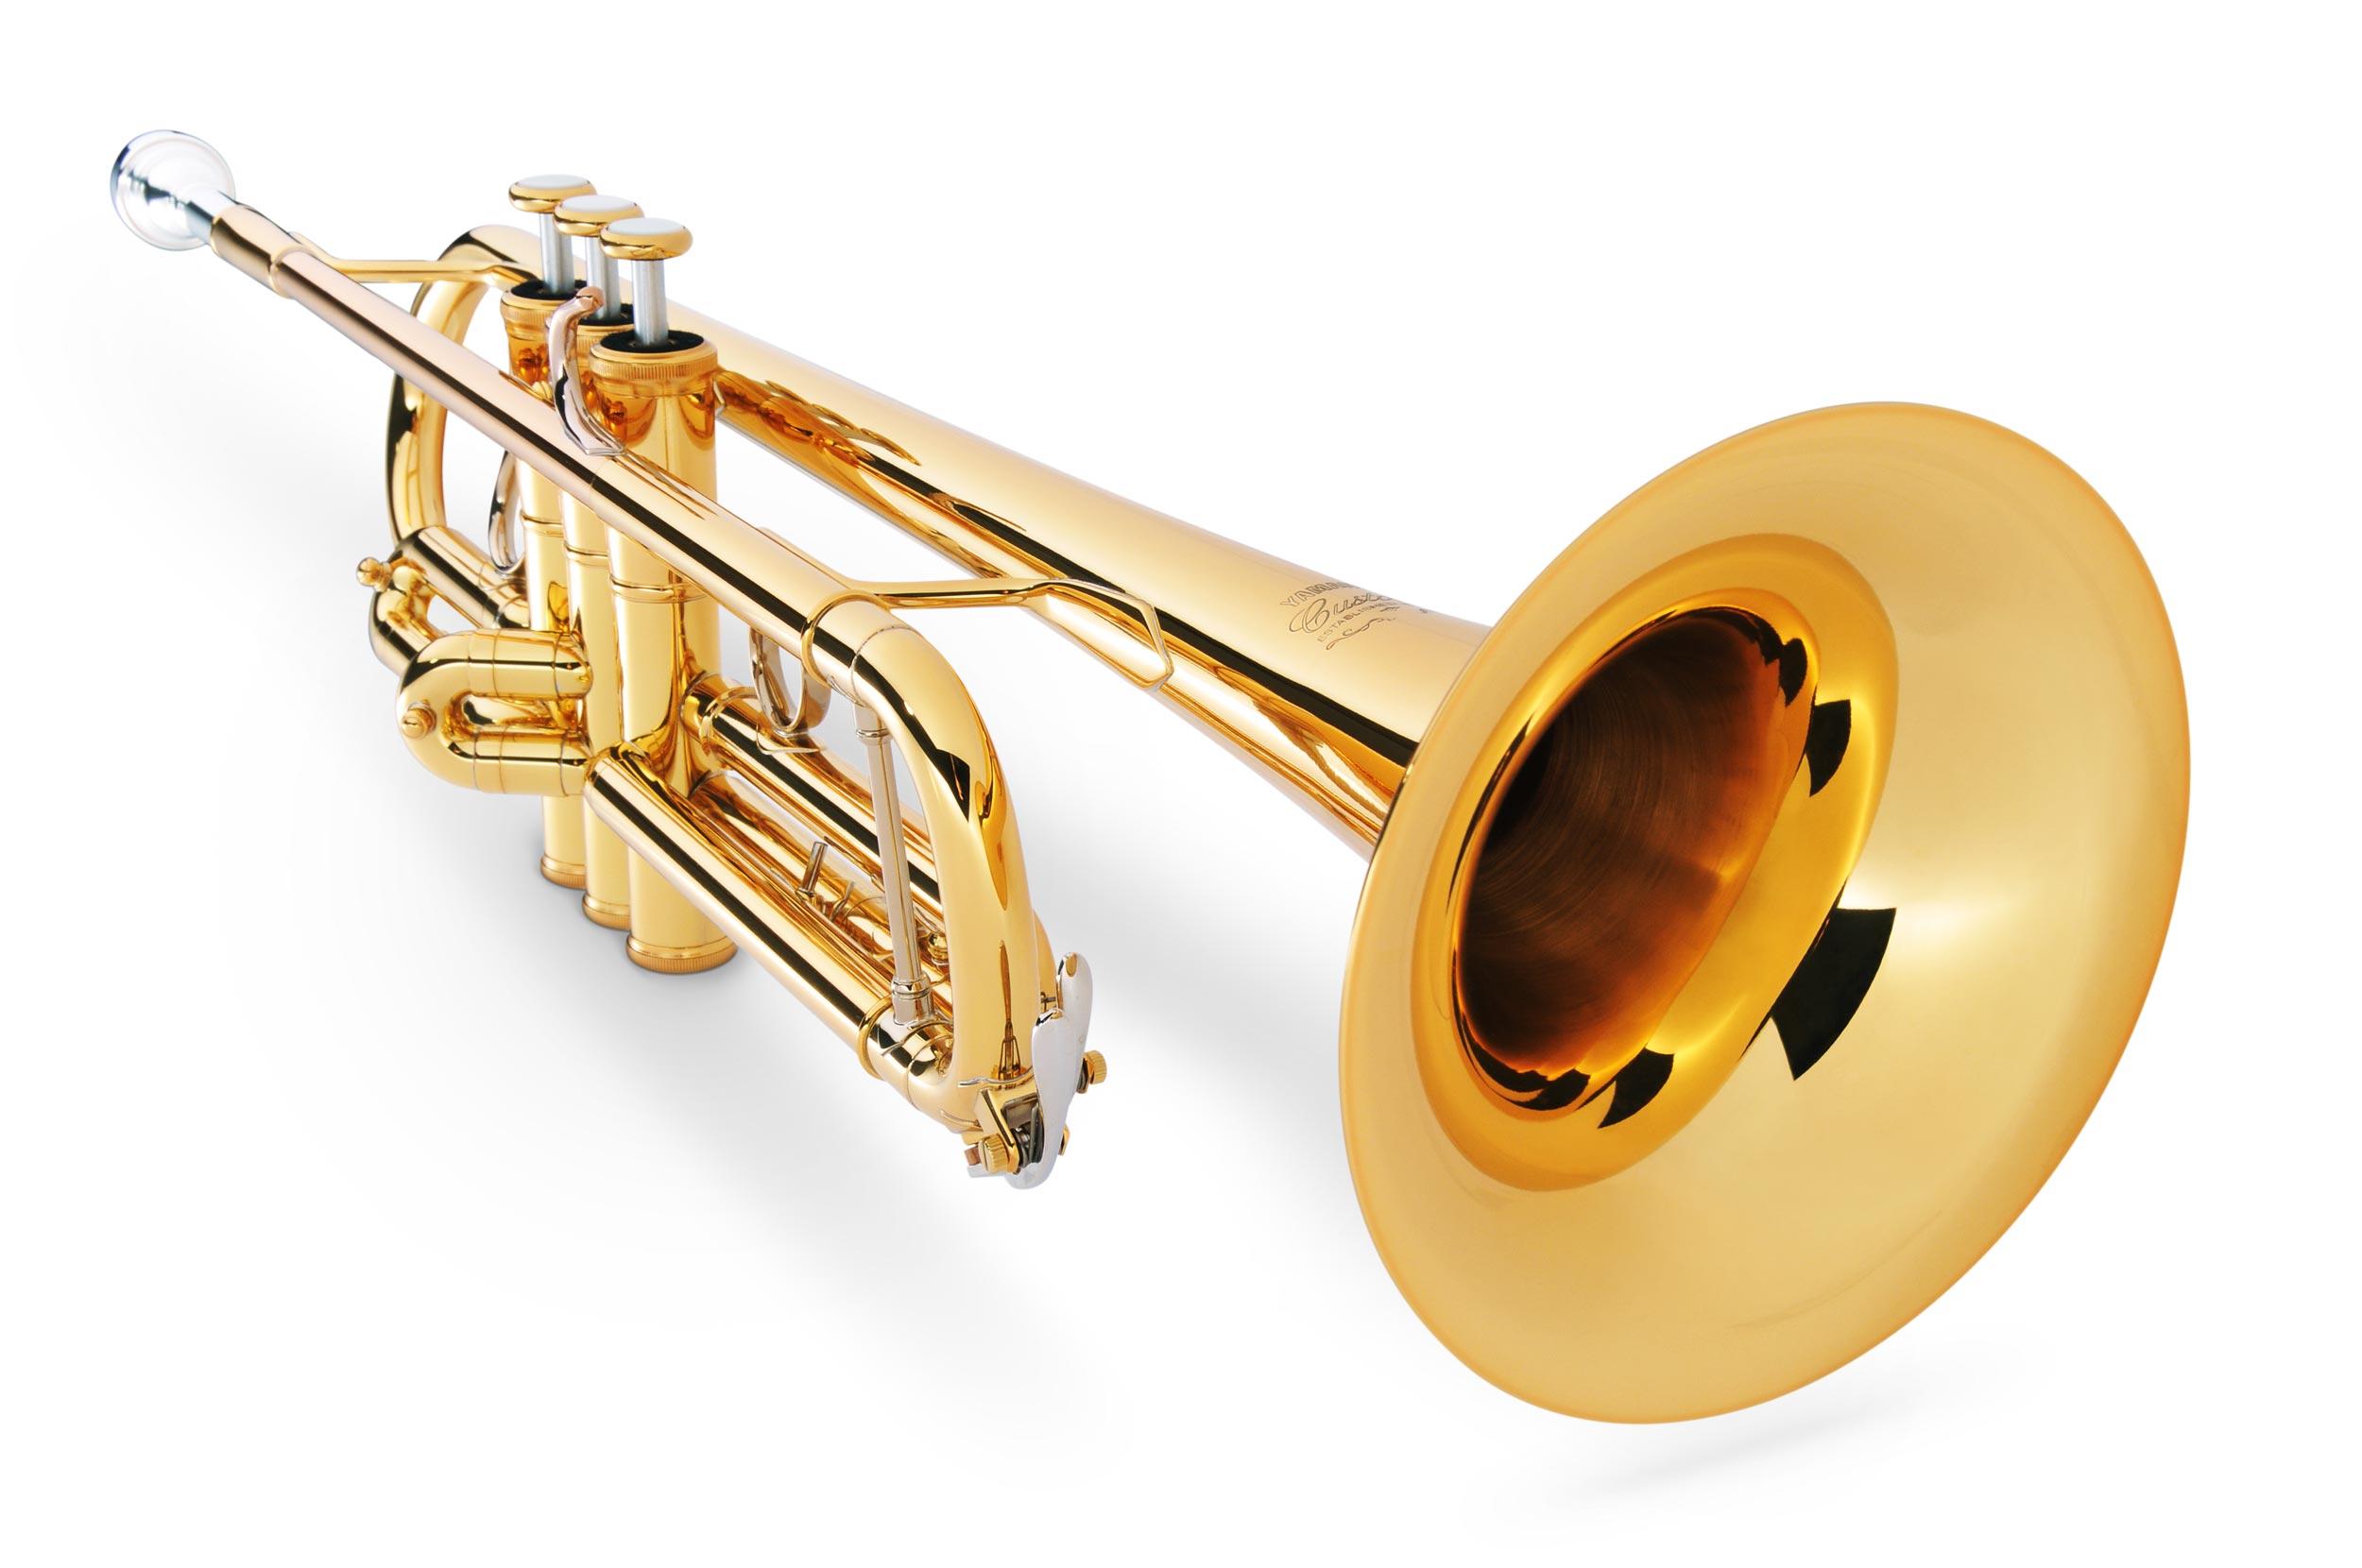 Yamaha Custom Trumpet - Trumpet HD PNG